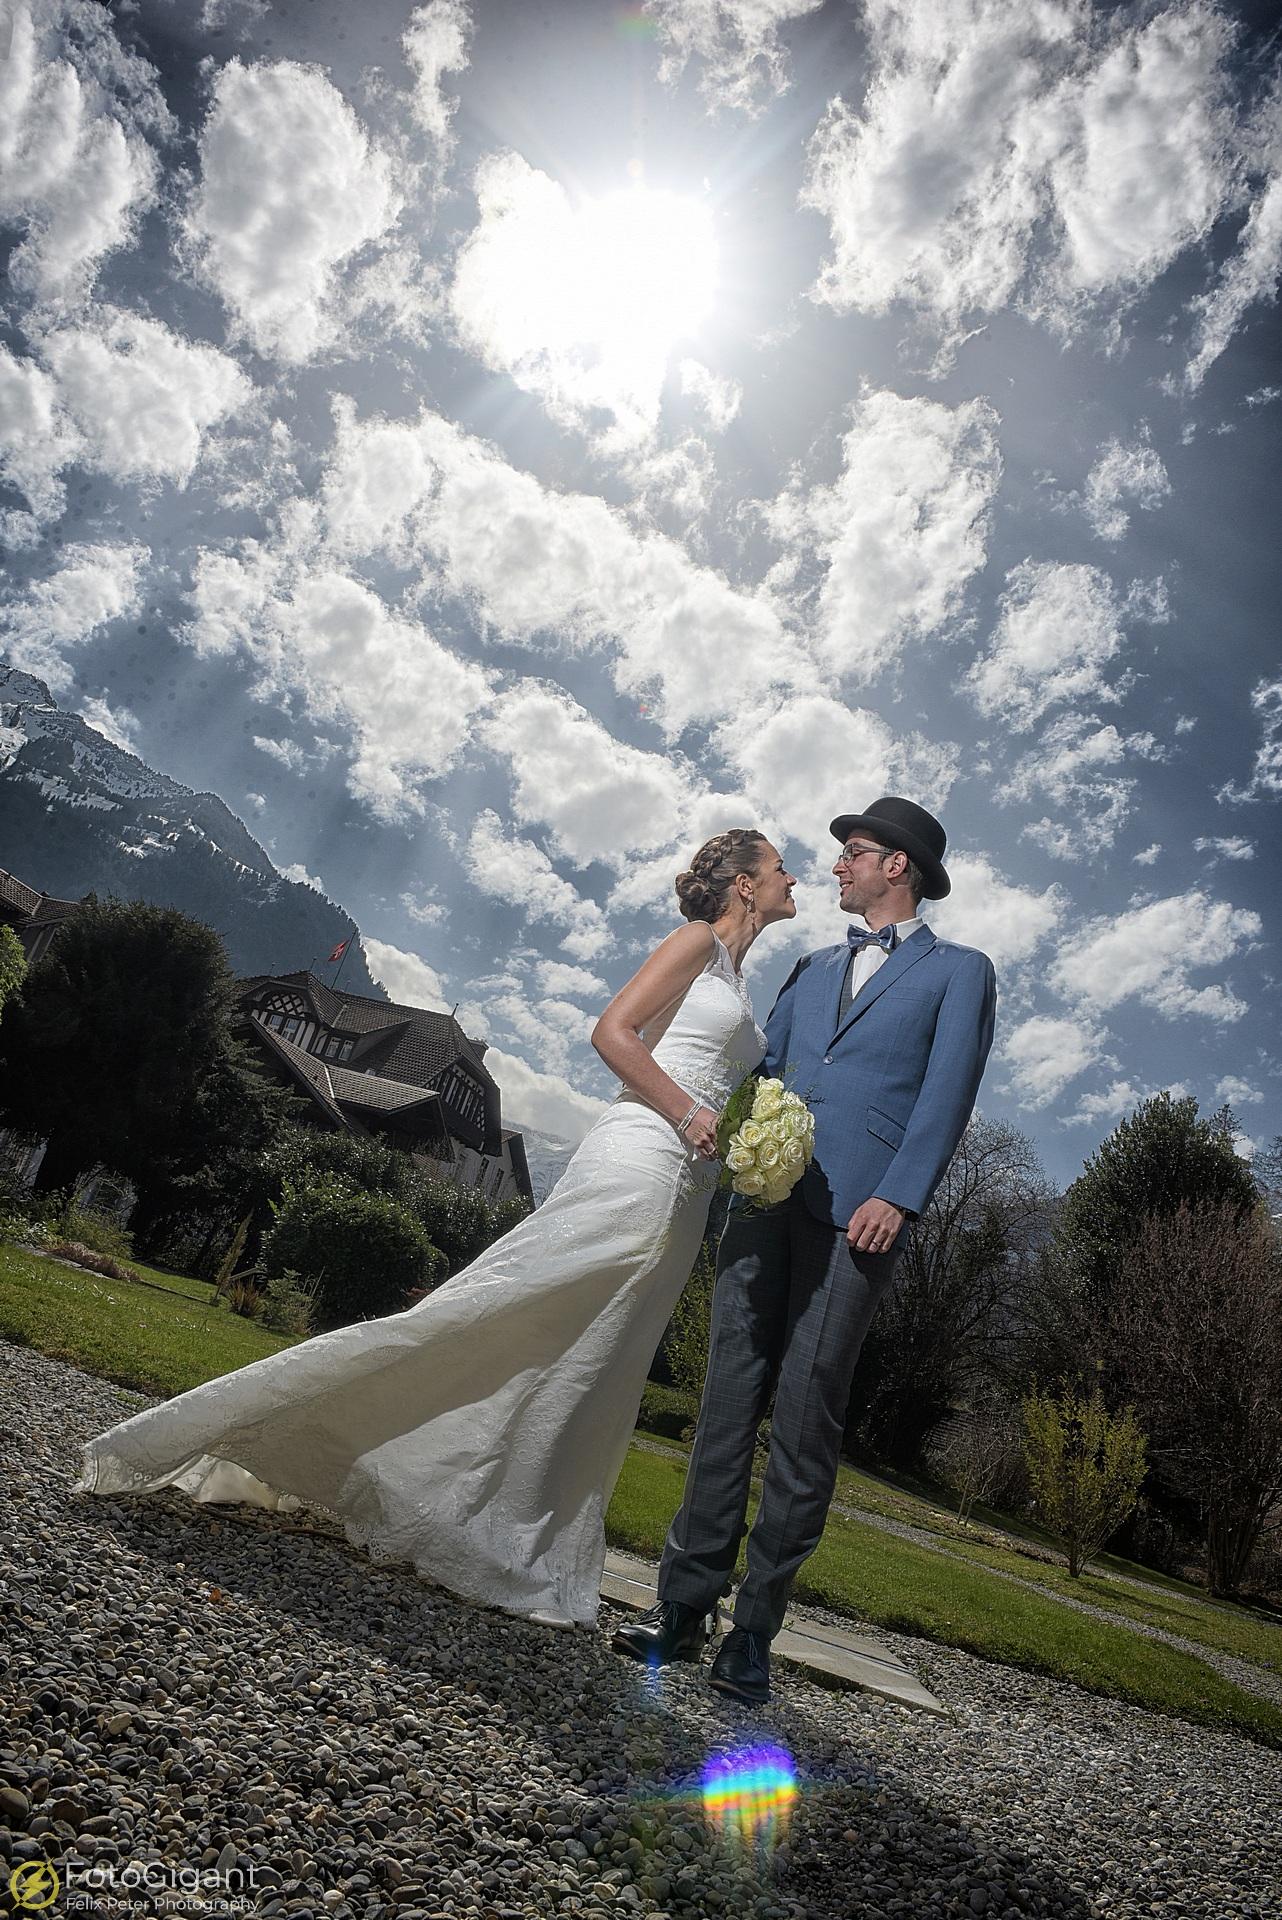 Hochzeitsfotografiekurs_Fotograf_Felix_Peter_26.jpg